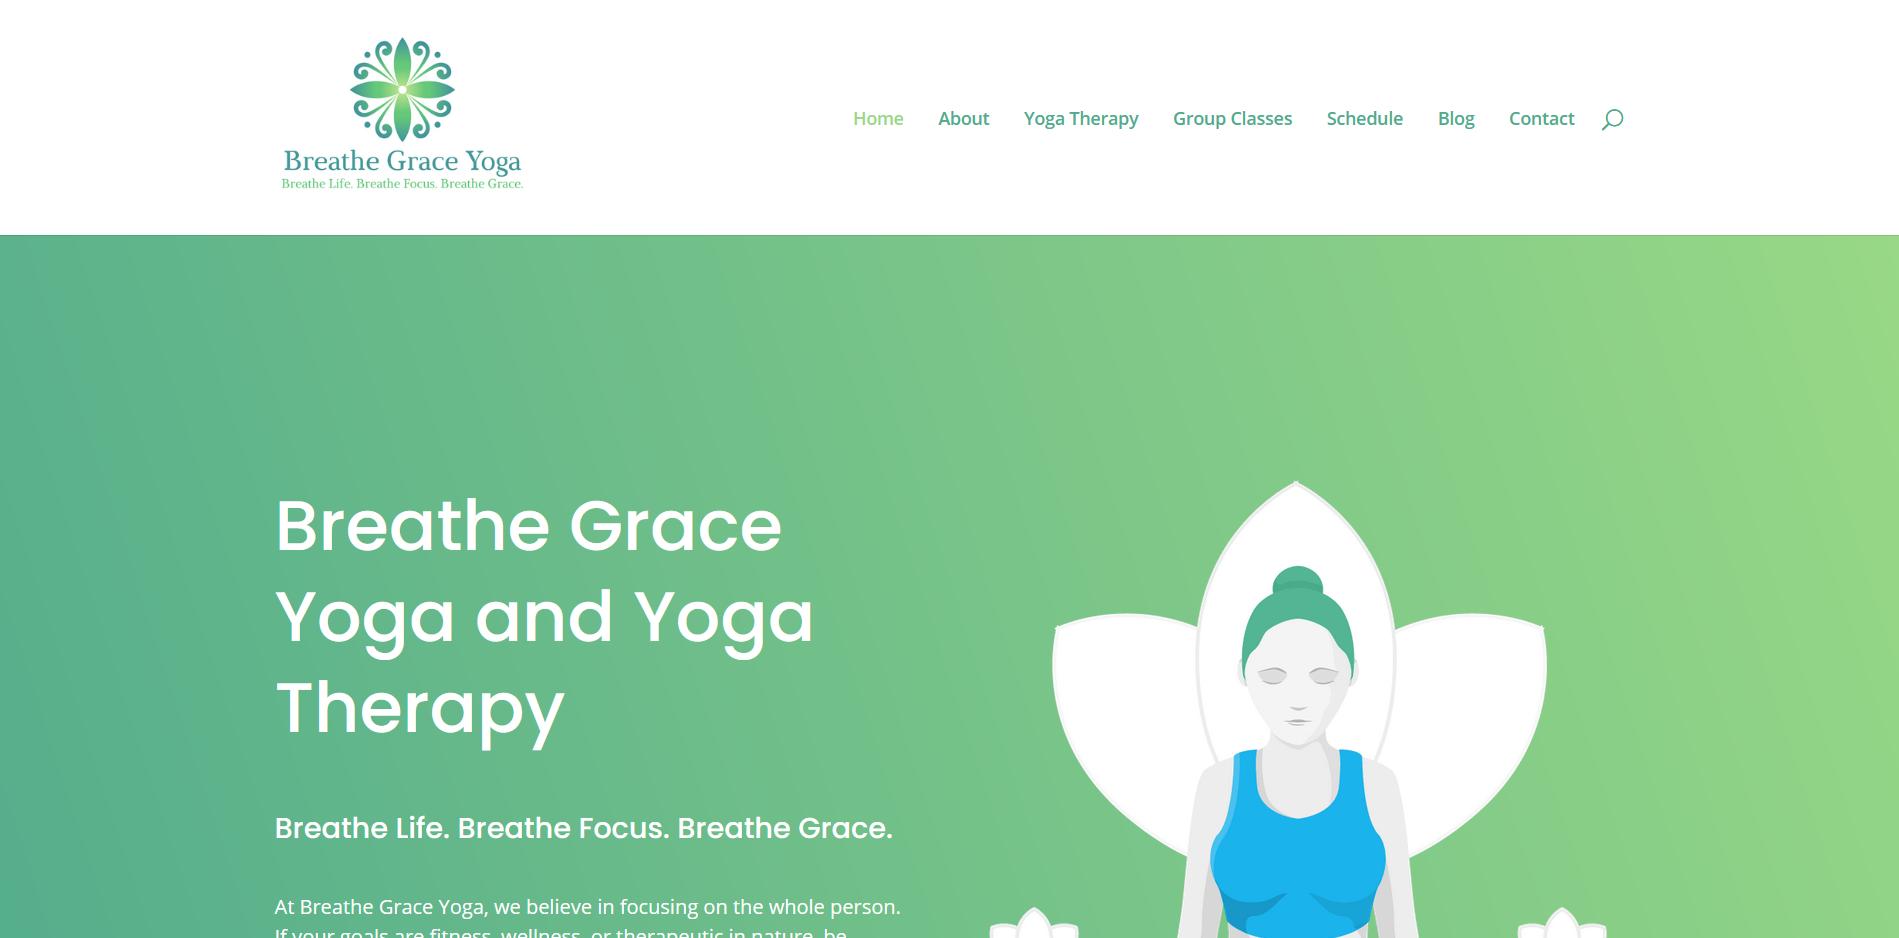 Breathe Grace Yoga Website Screenshot